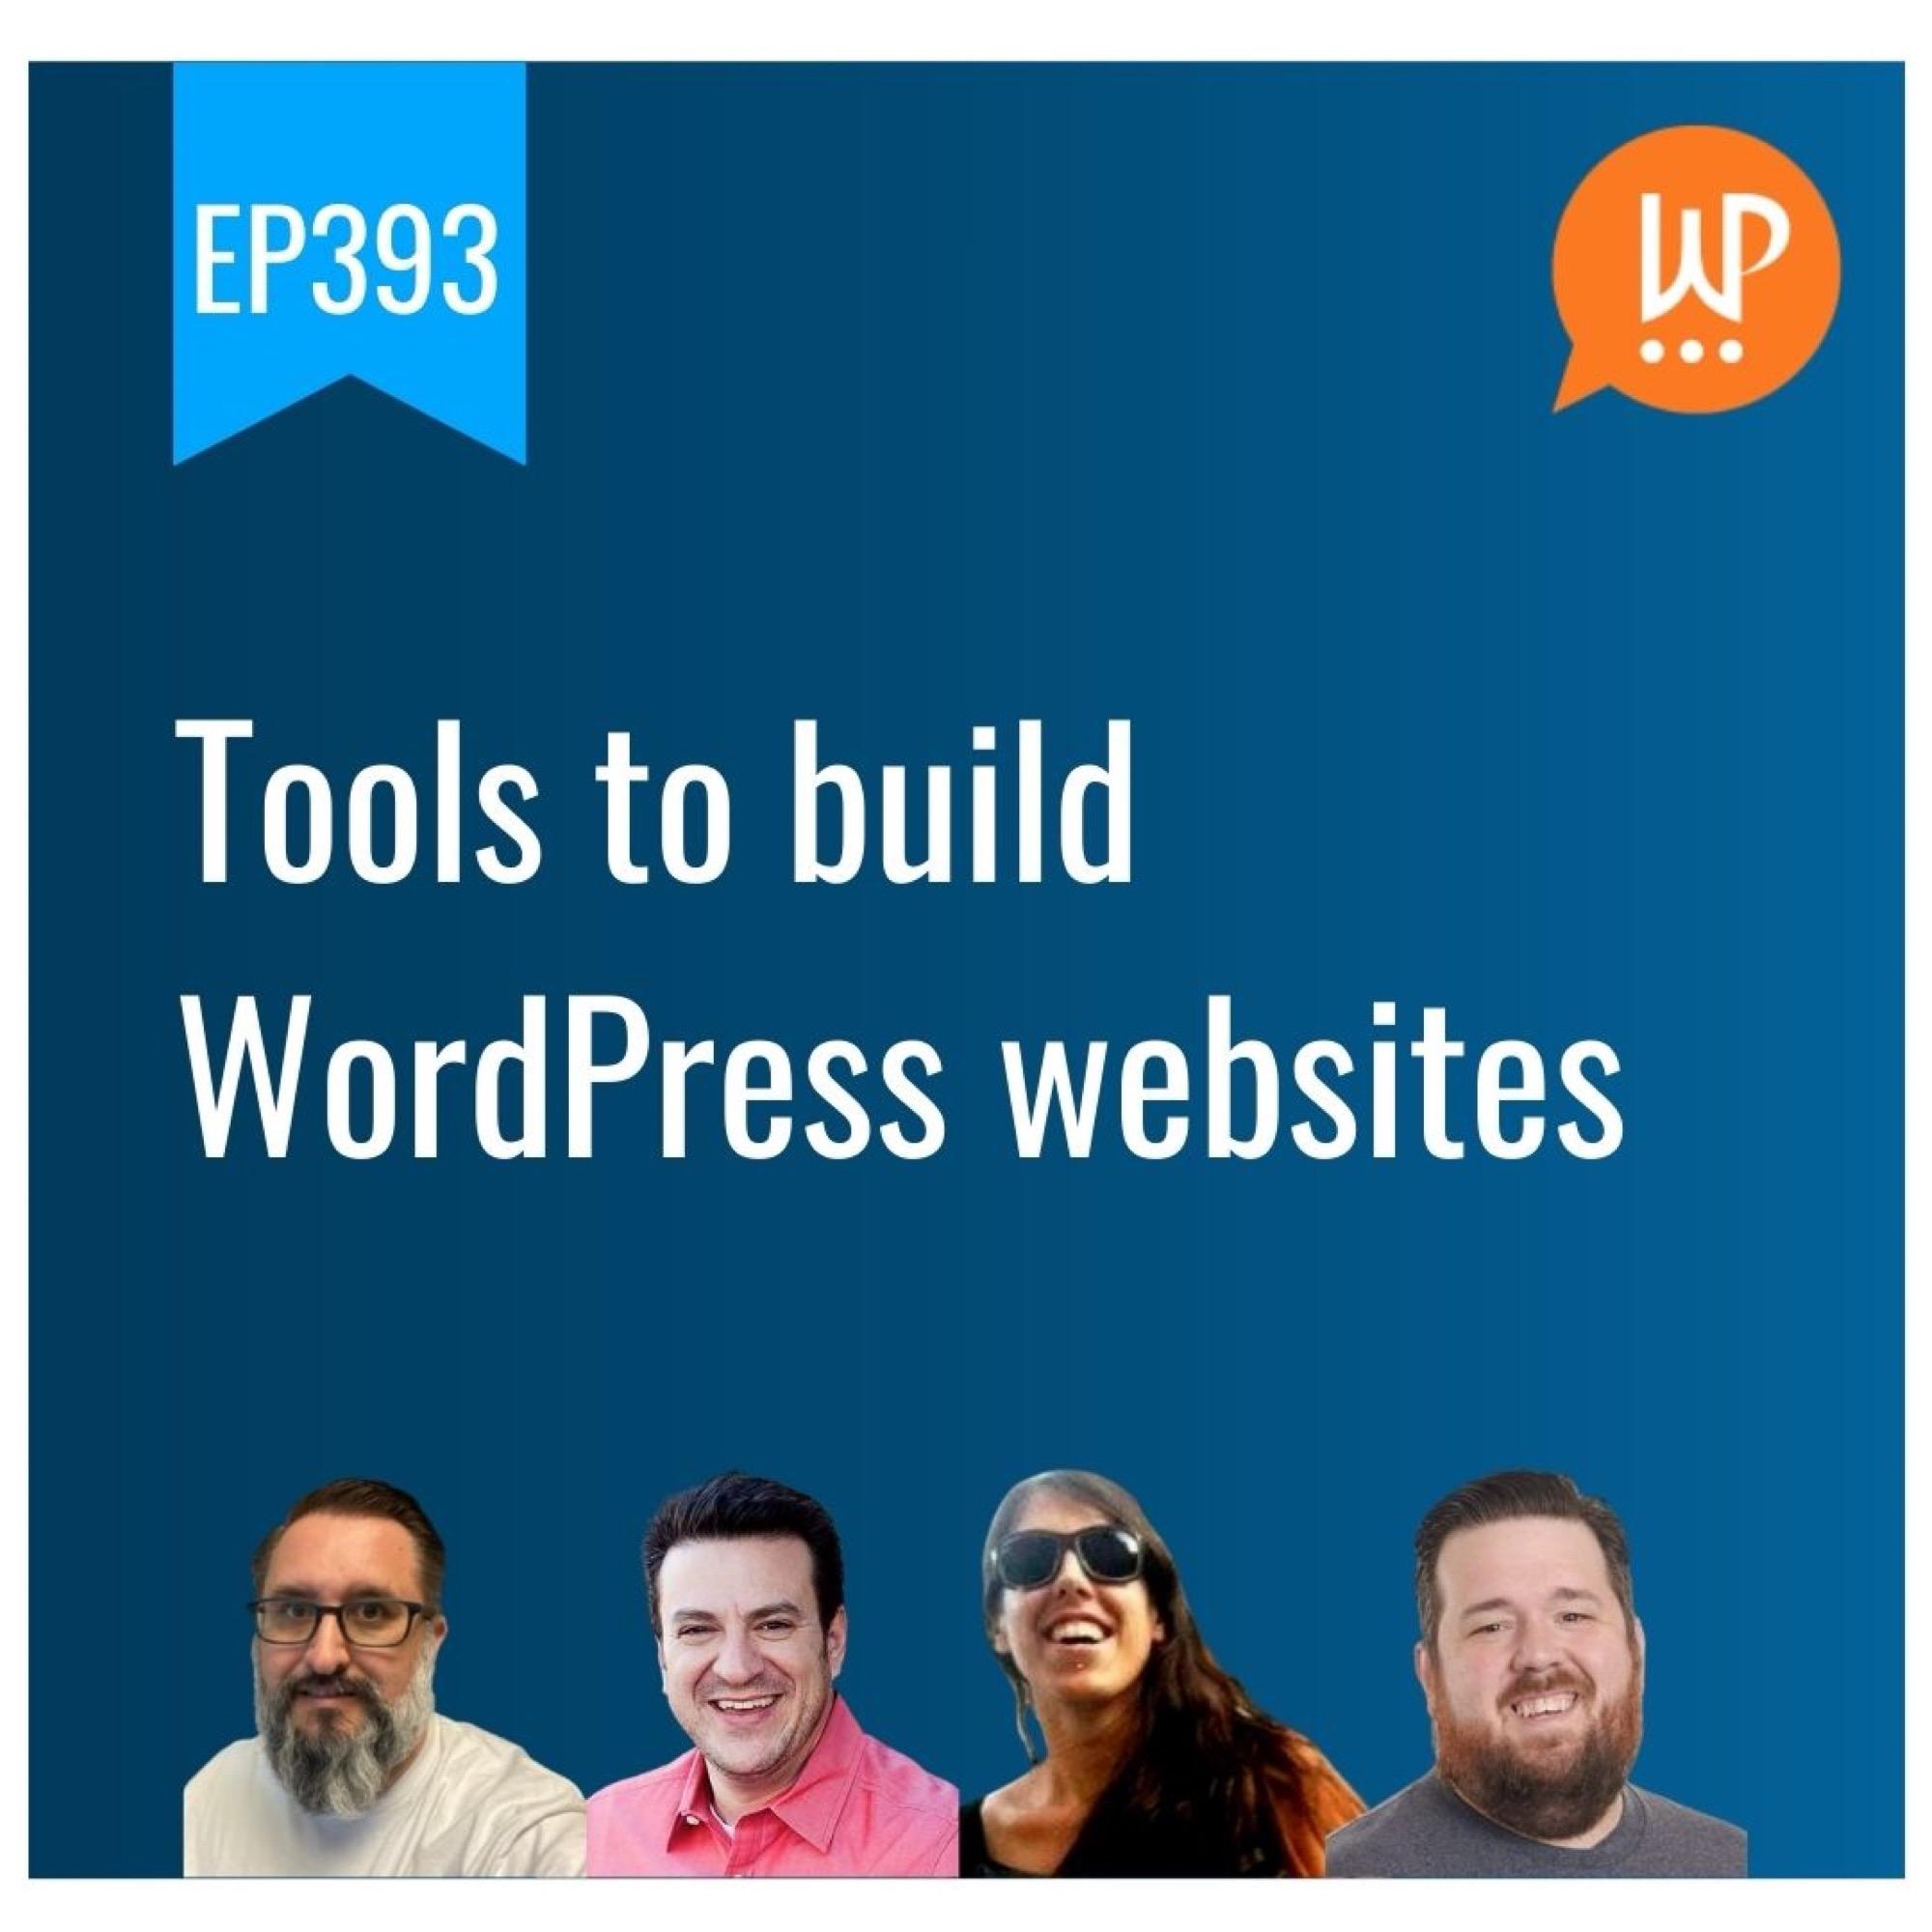 EP393 – Tools to build WordPress websites